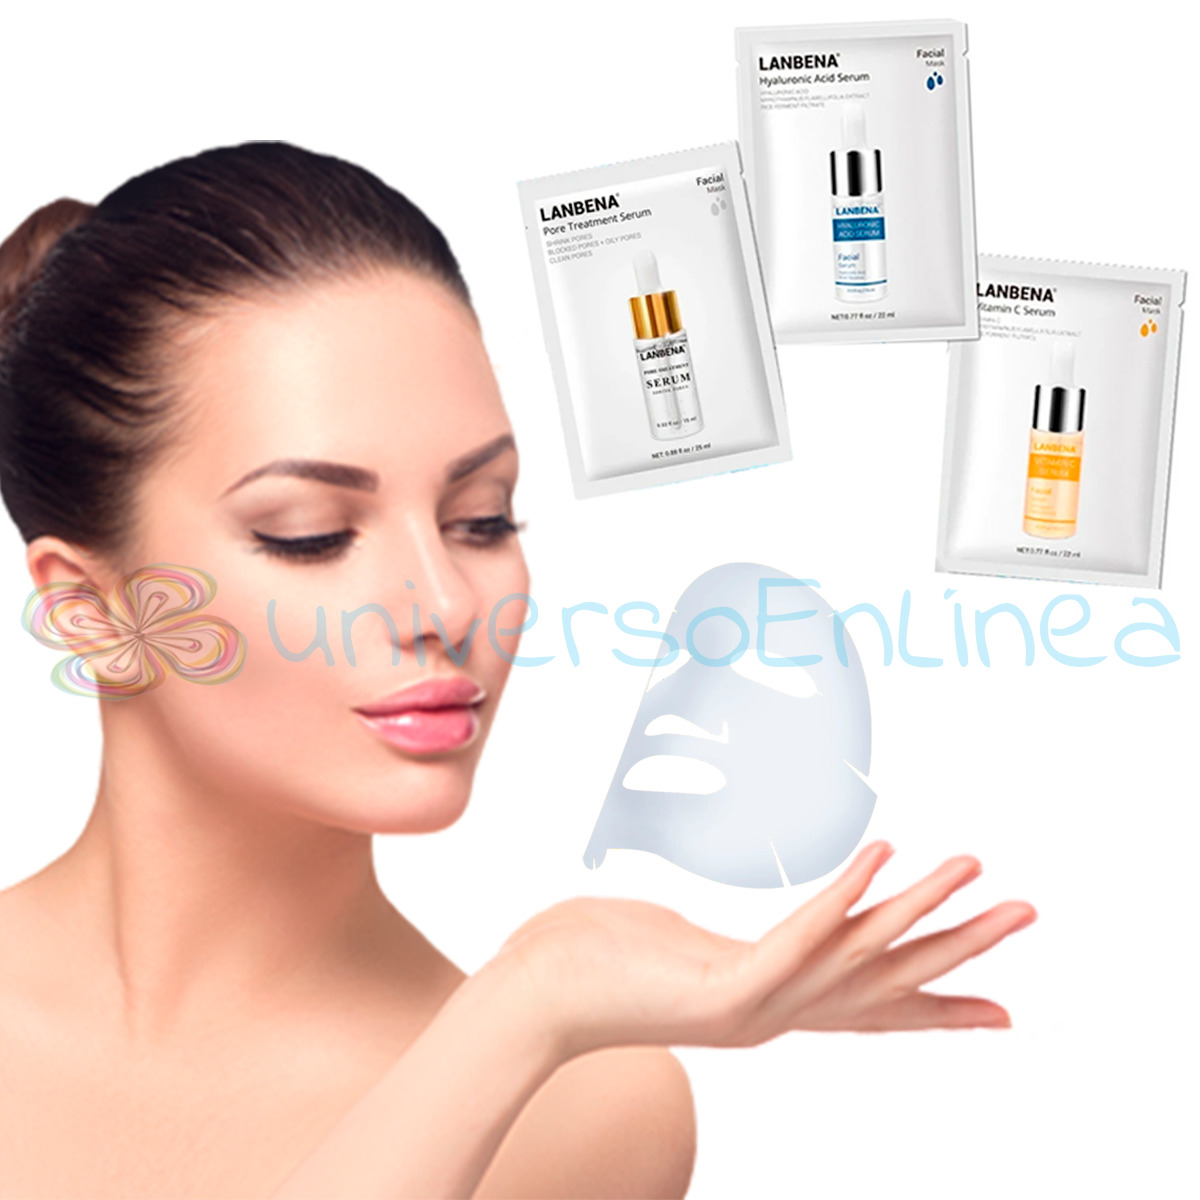 Paquete Lanbena Facial Mask Serum 3pzs